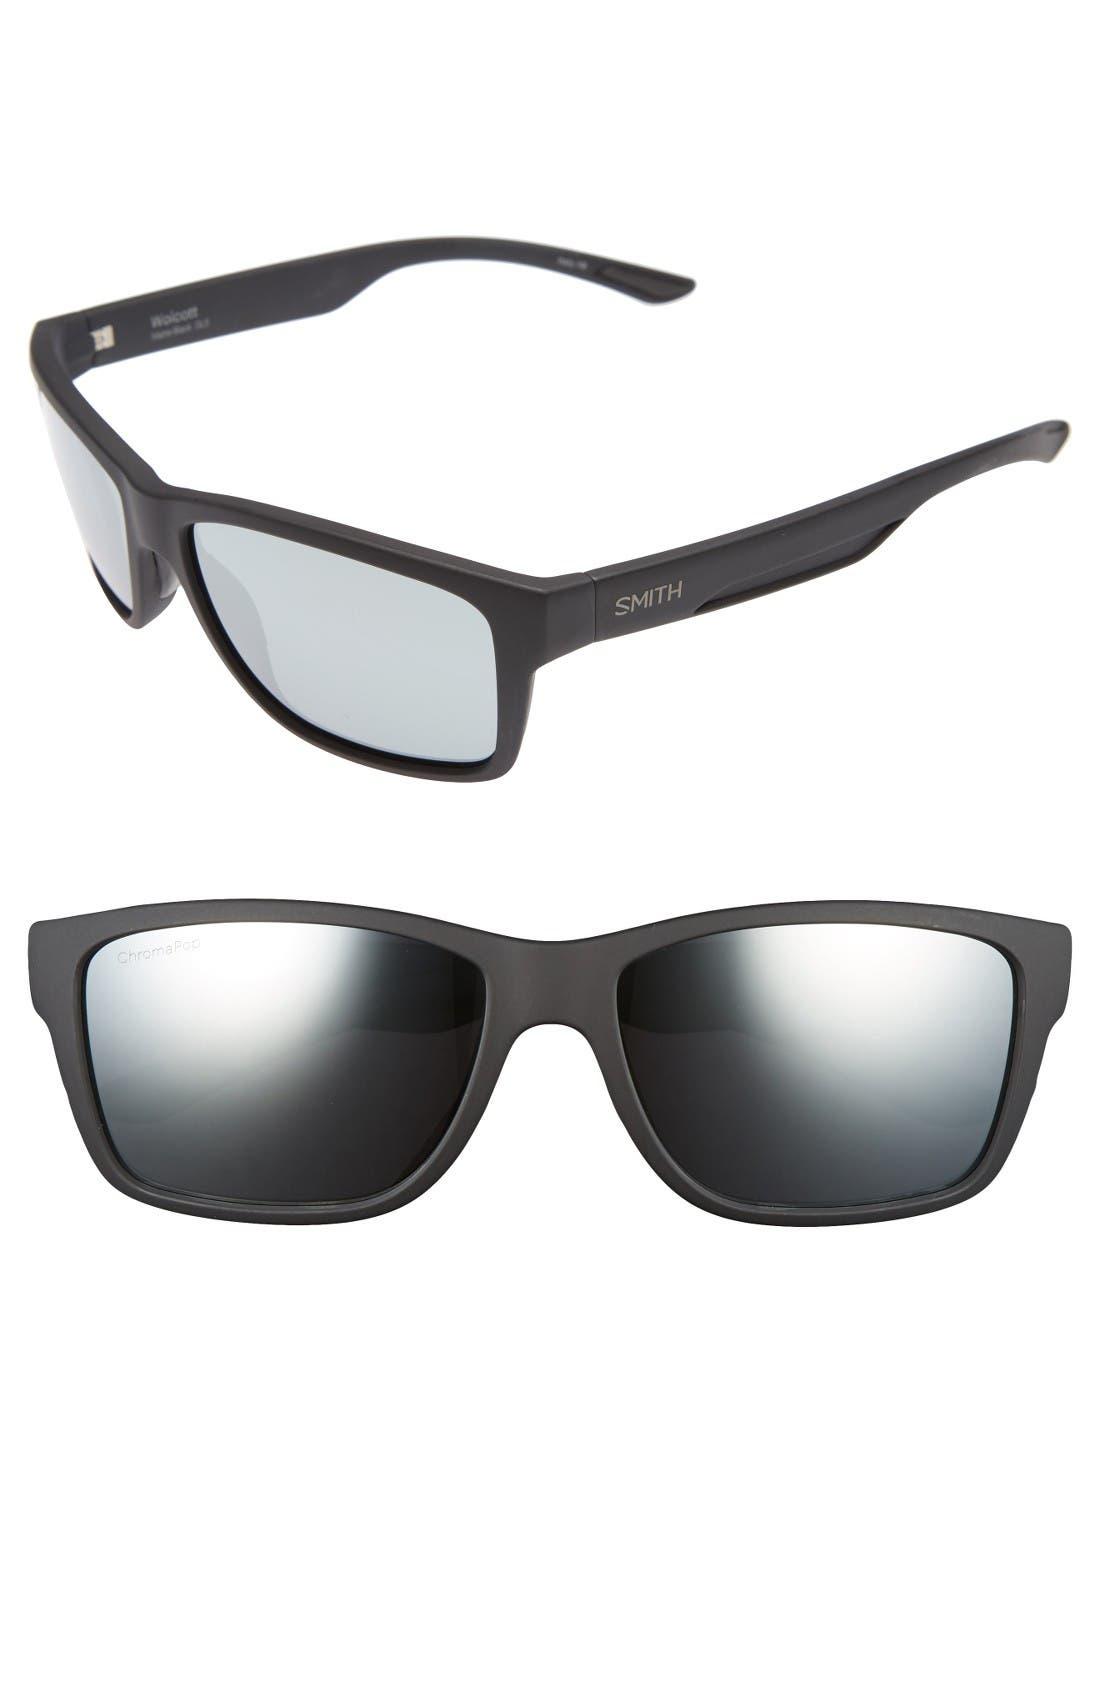 Wolcott 58mm Polarized Sunglasses,                             Main thumbnail 1, color,                             Matte Black/ Platinum Lens